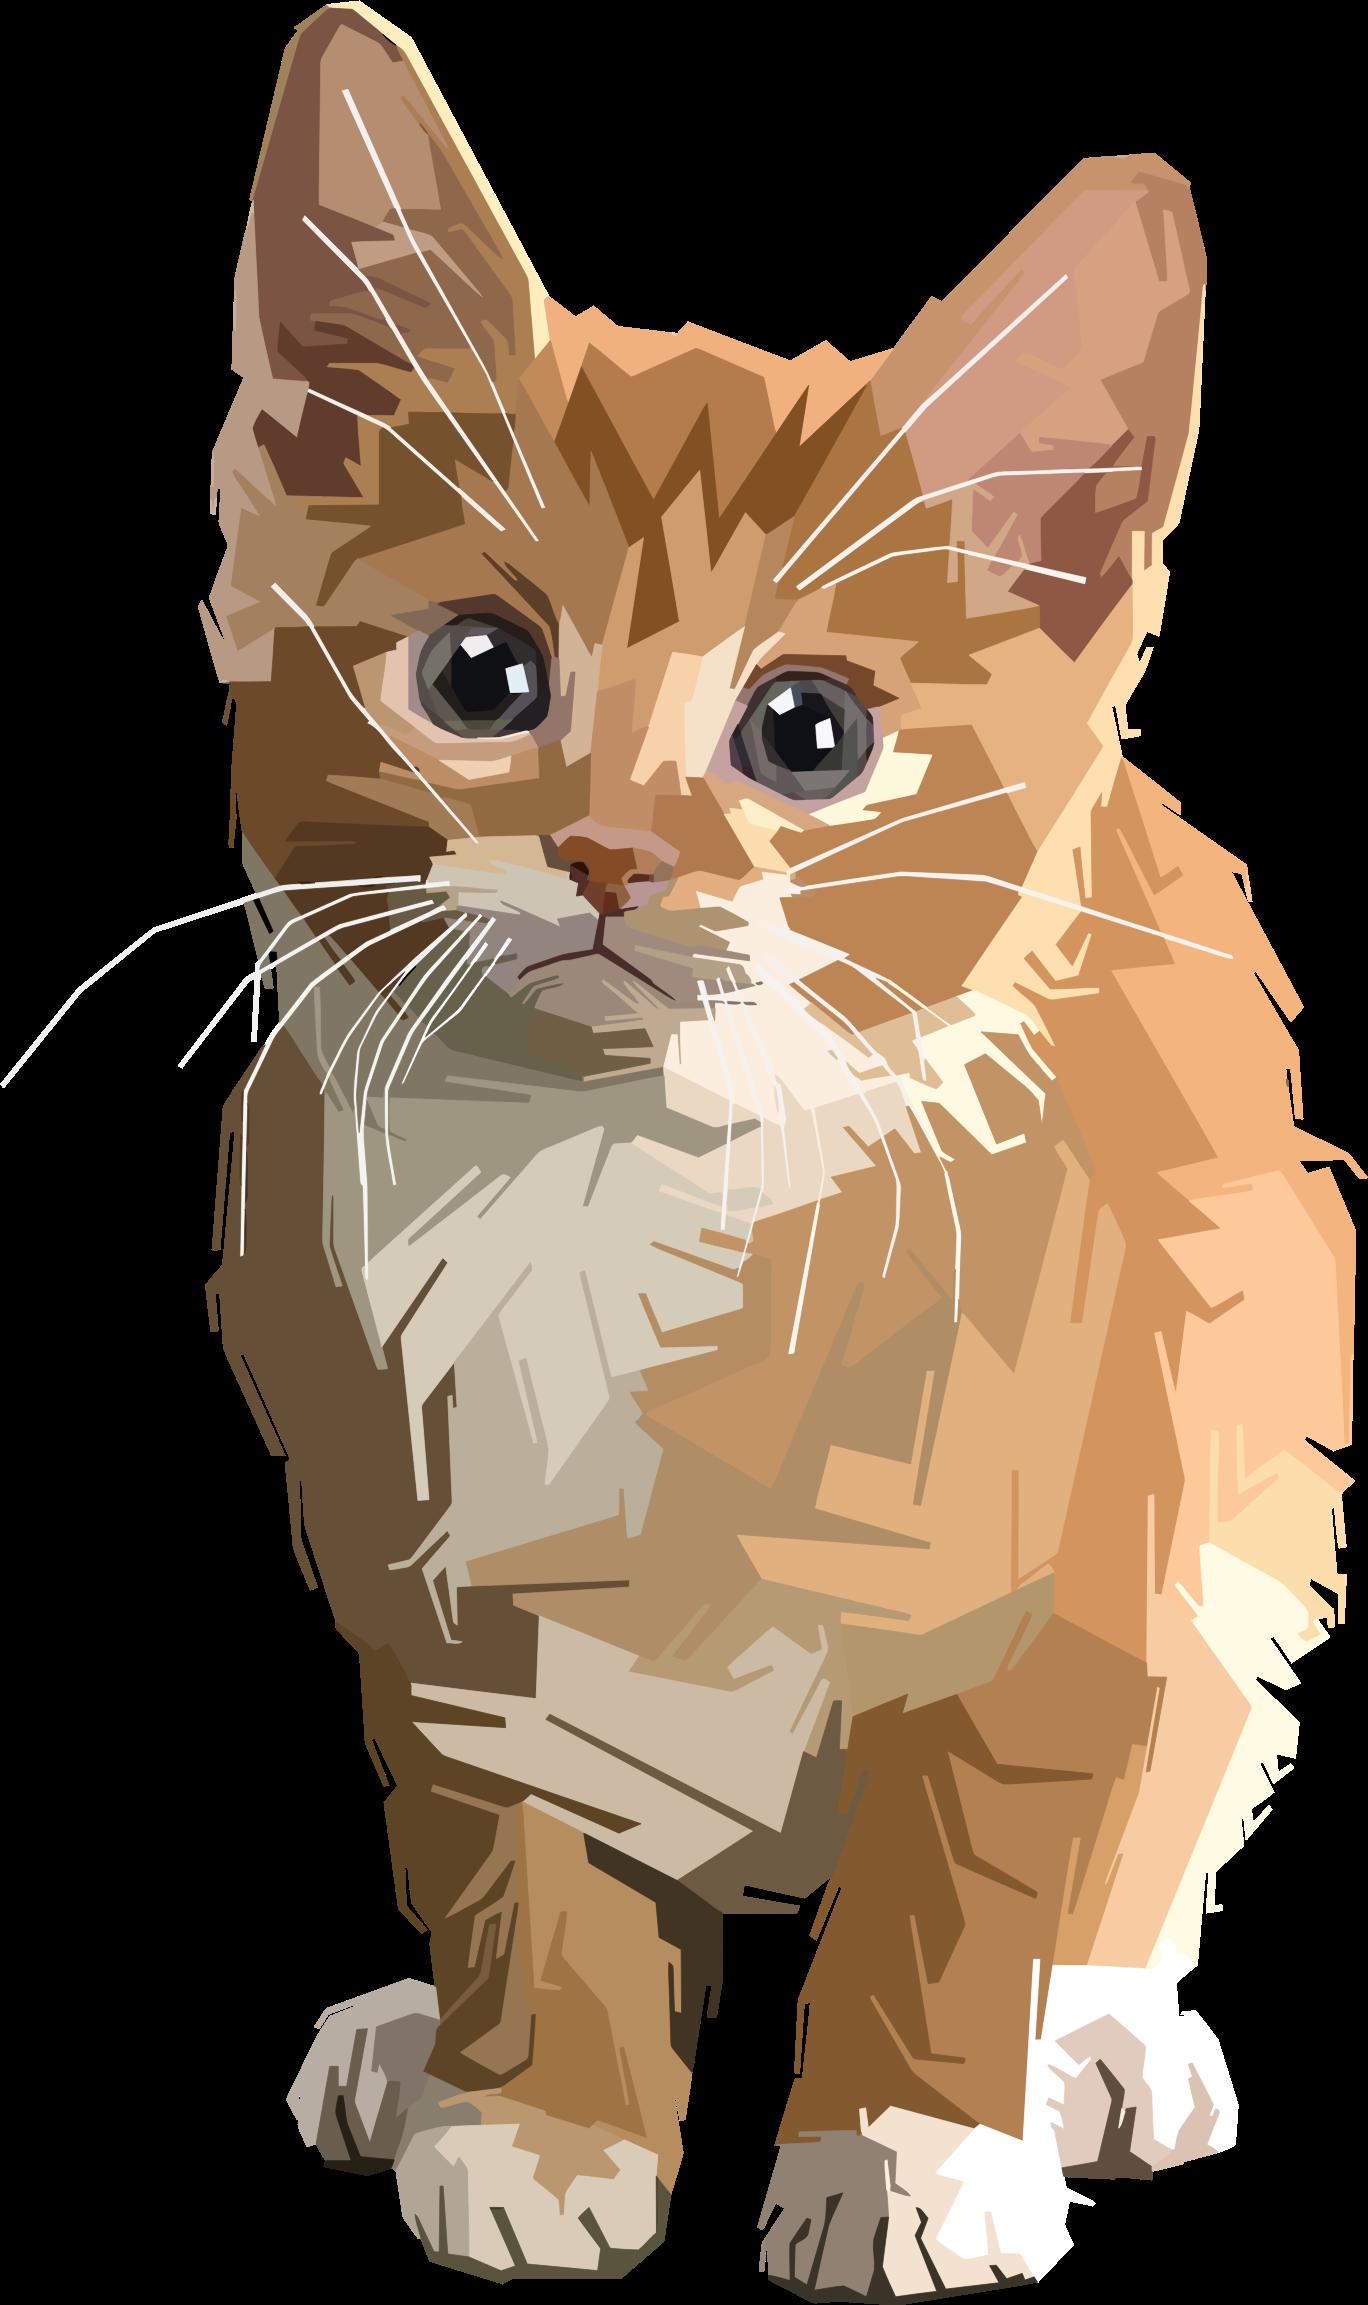 Kitty clipart tabby cat. Stylized geometric kitten big